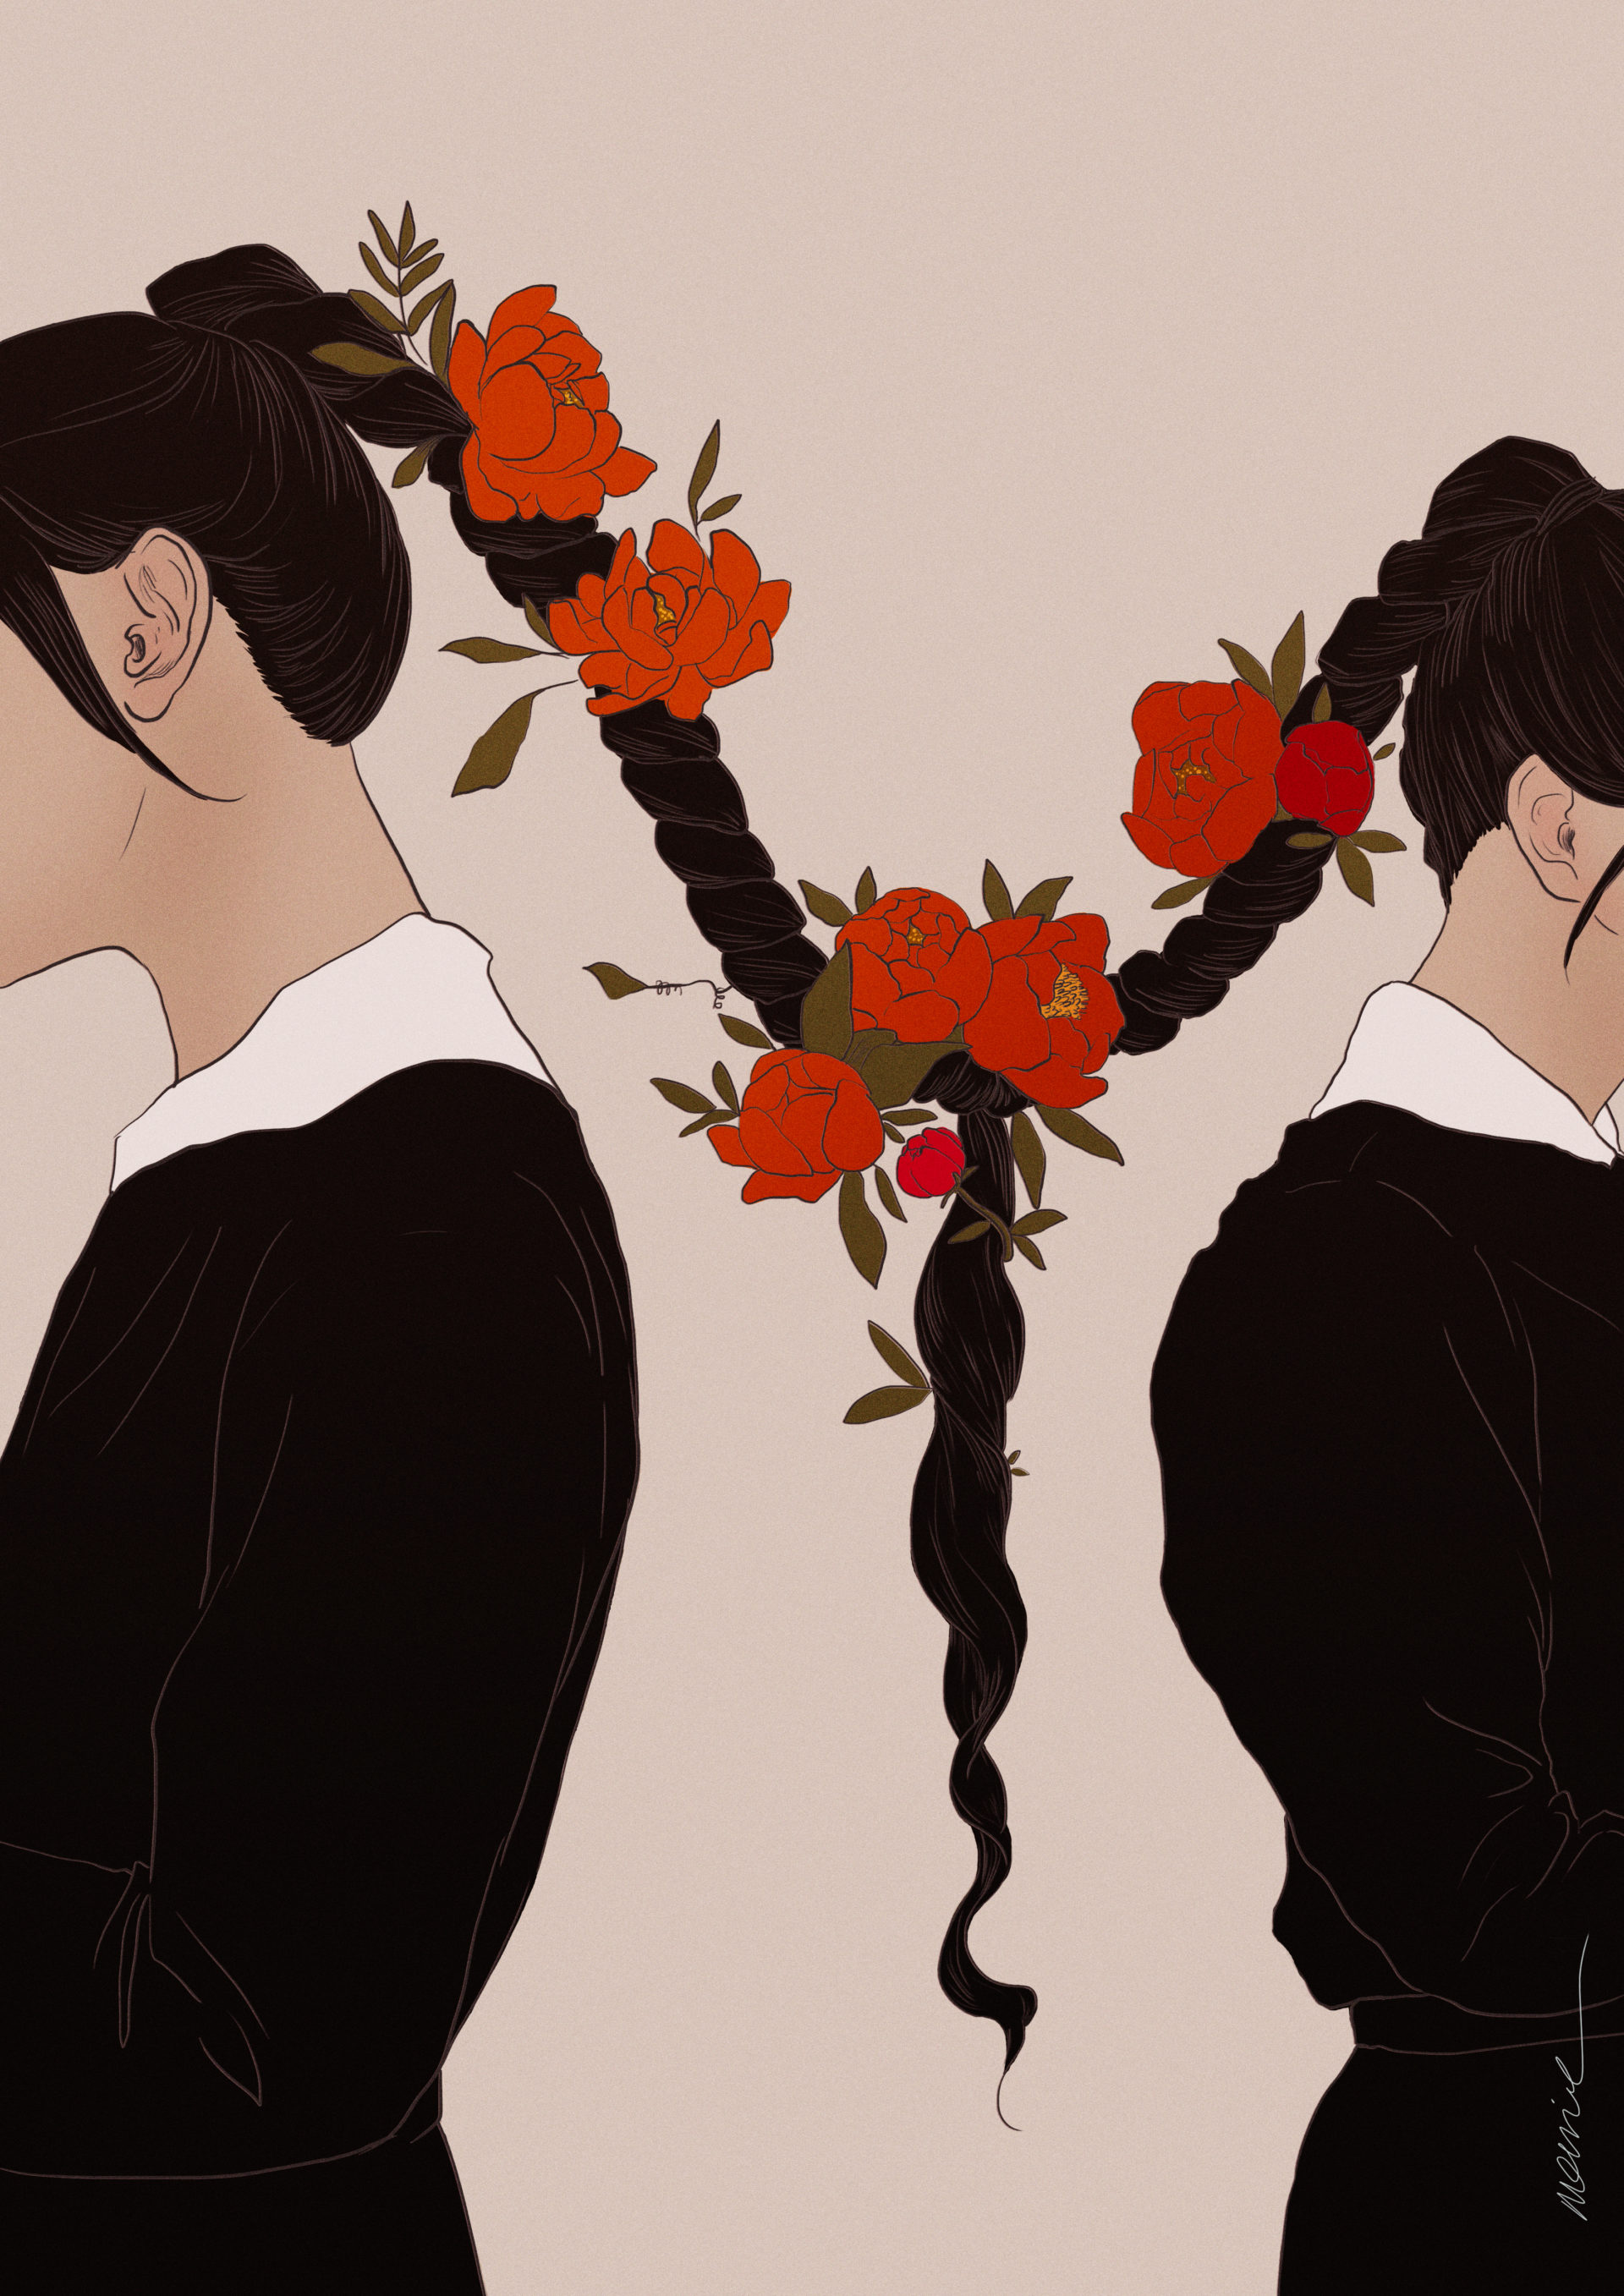 Marie_02